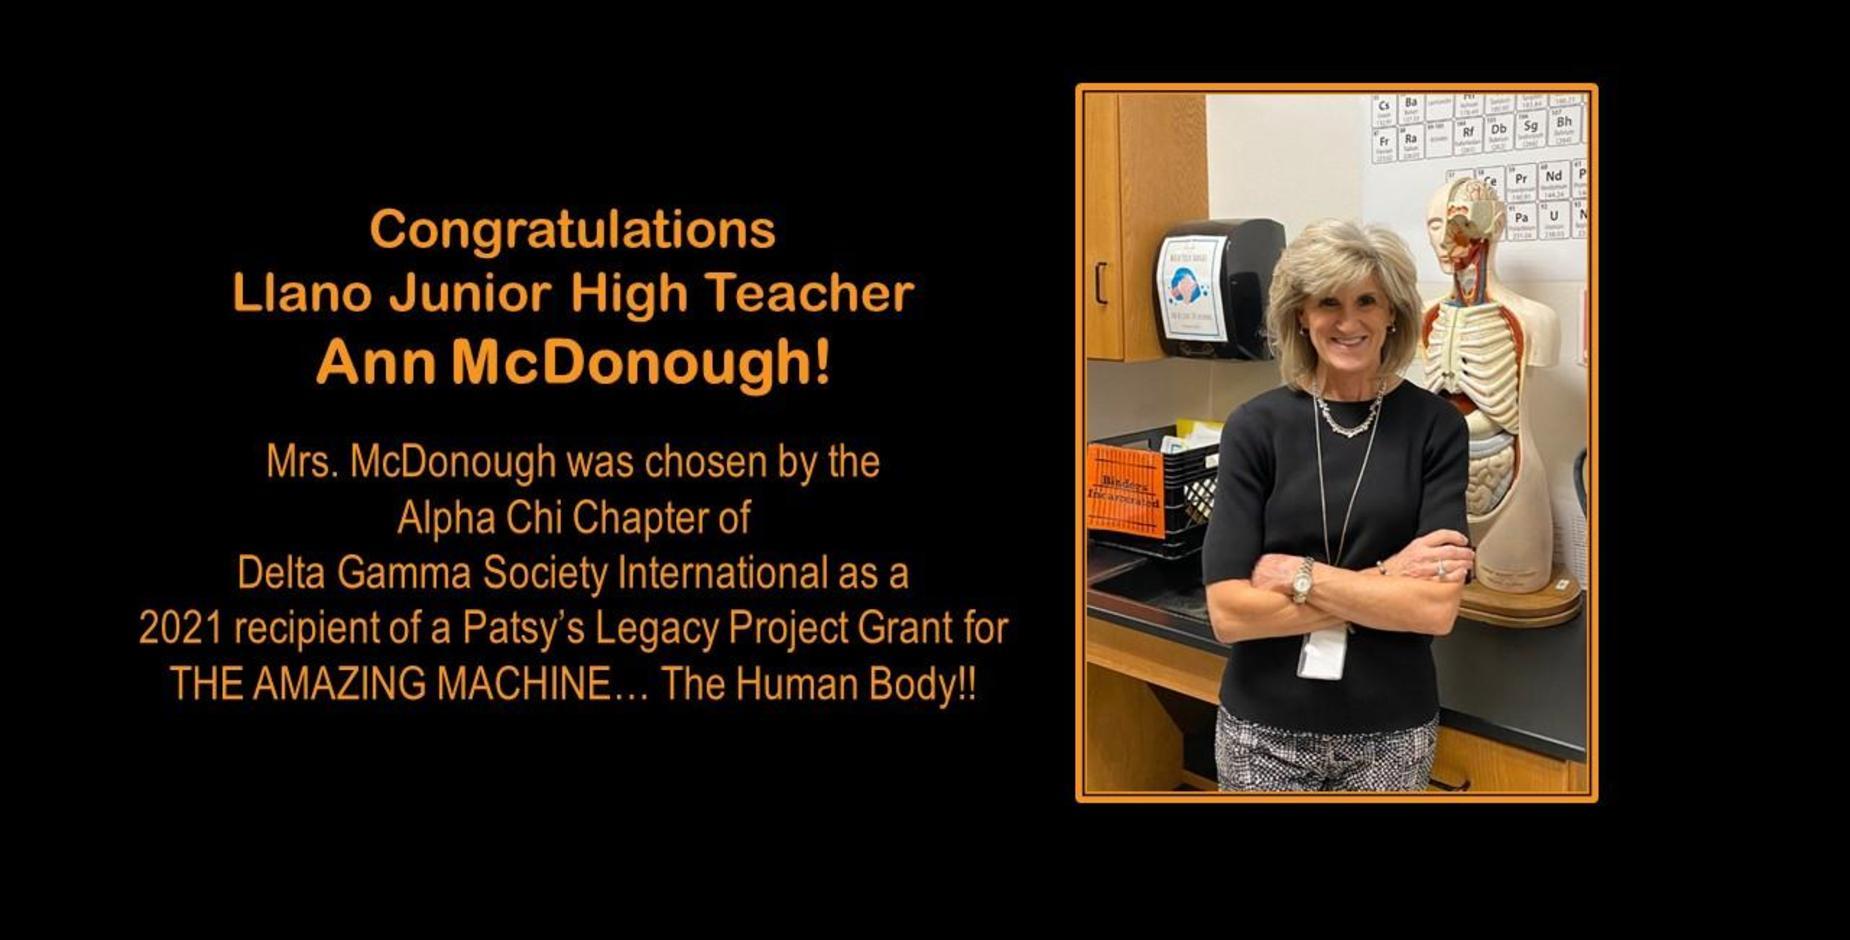 Congrats Mrs. McDonough